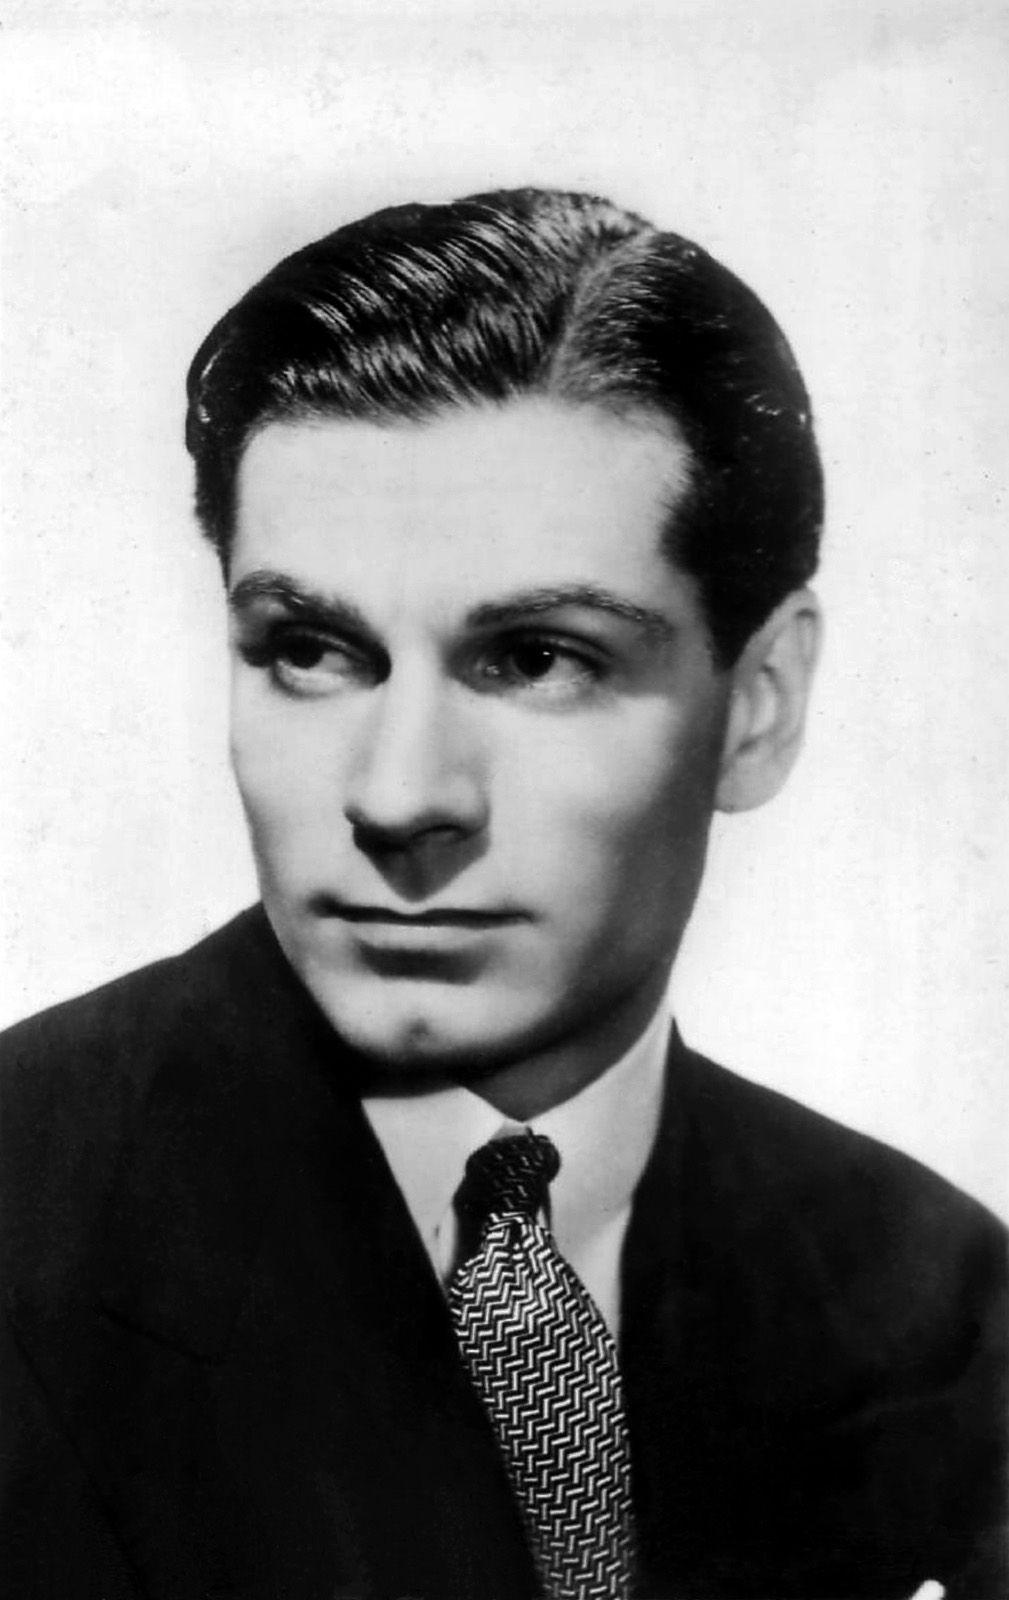 Laurence Olivier | C l a s s i c | H o l l y w o o d ...